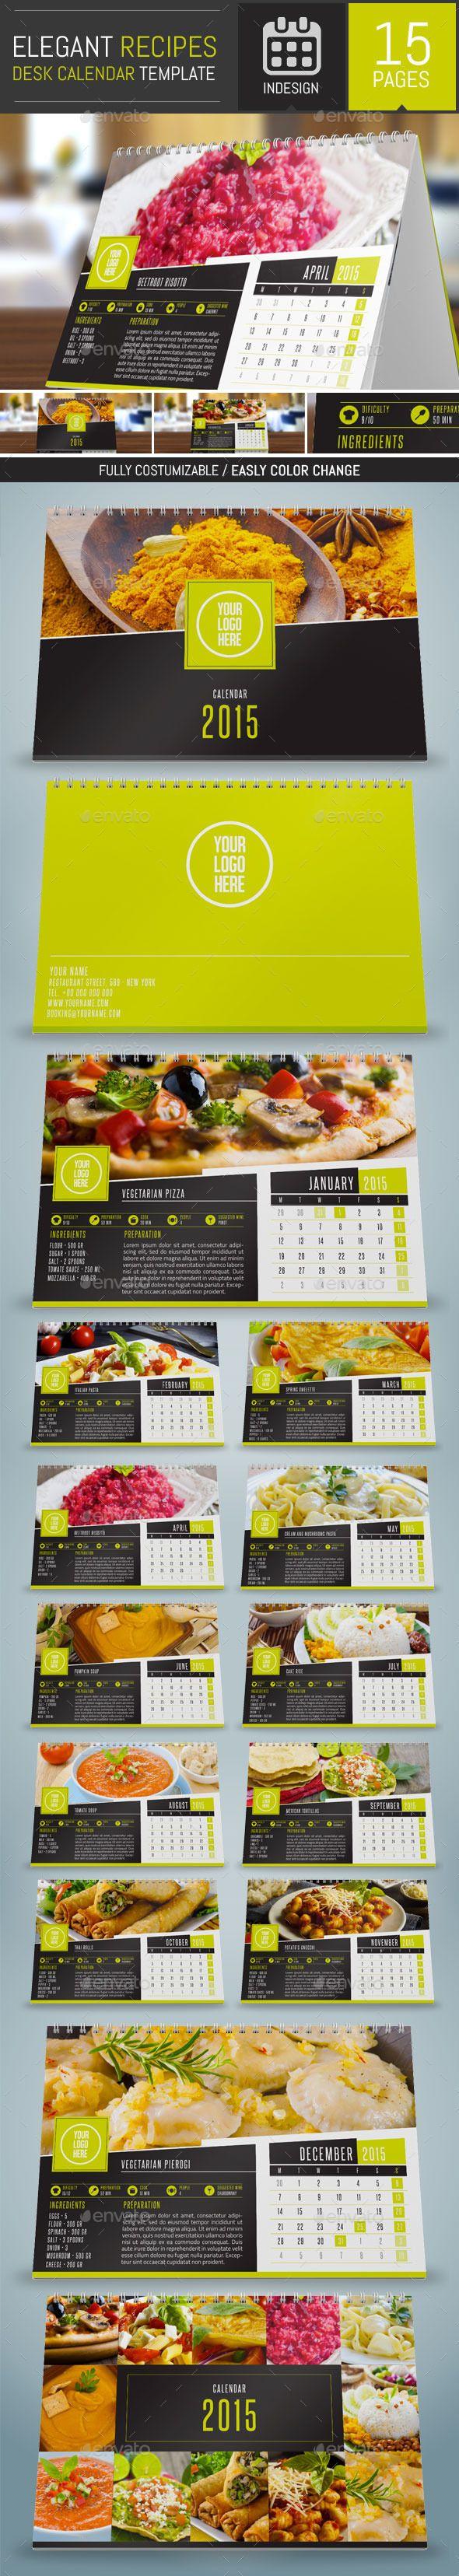 Elegant Recipes 2015 Desk Calendar Template | Buy and Download: http://graphicriver.net/item/elegant-recipes-2015-desk-calendar-template/9557533?ref=ksioks